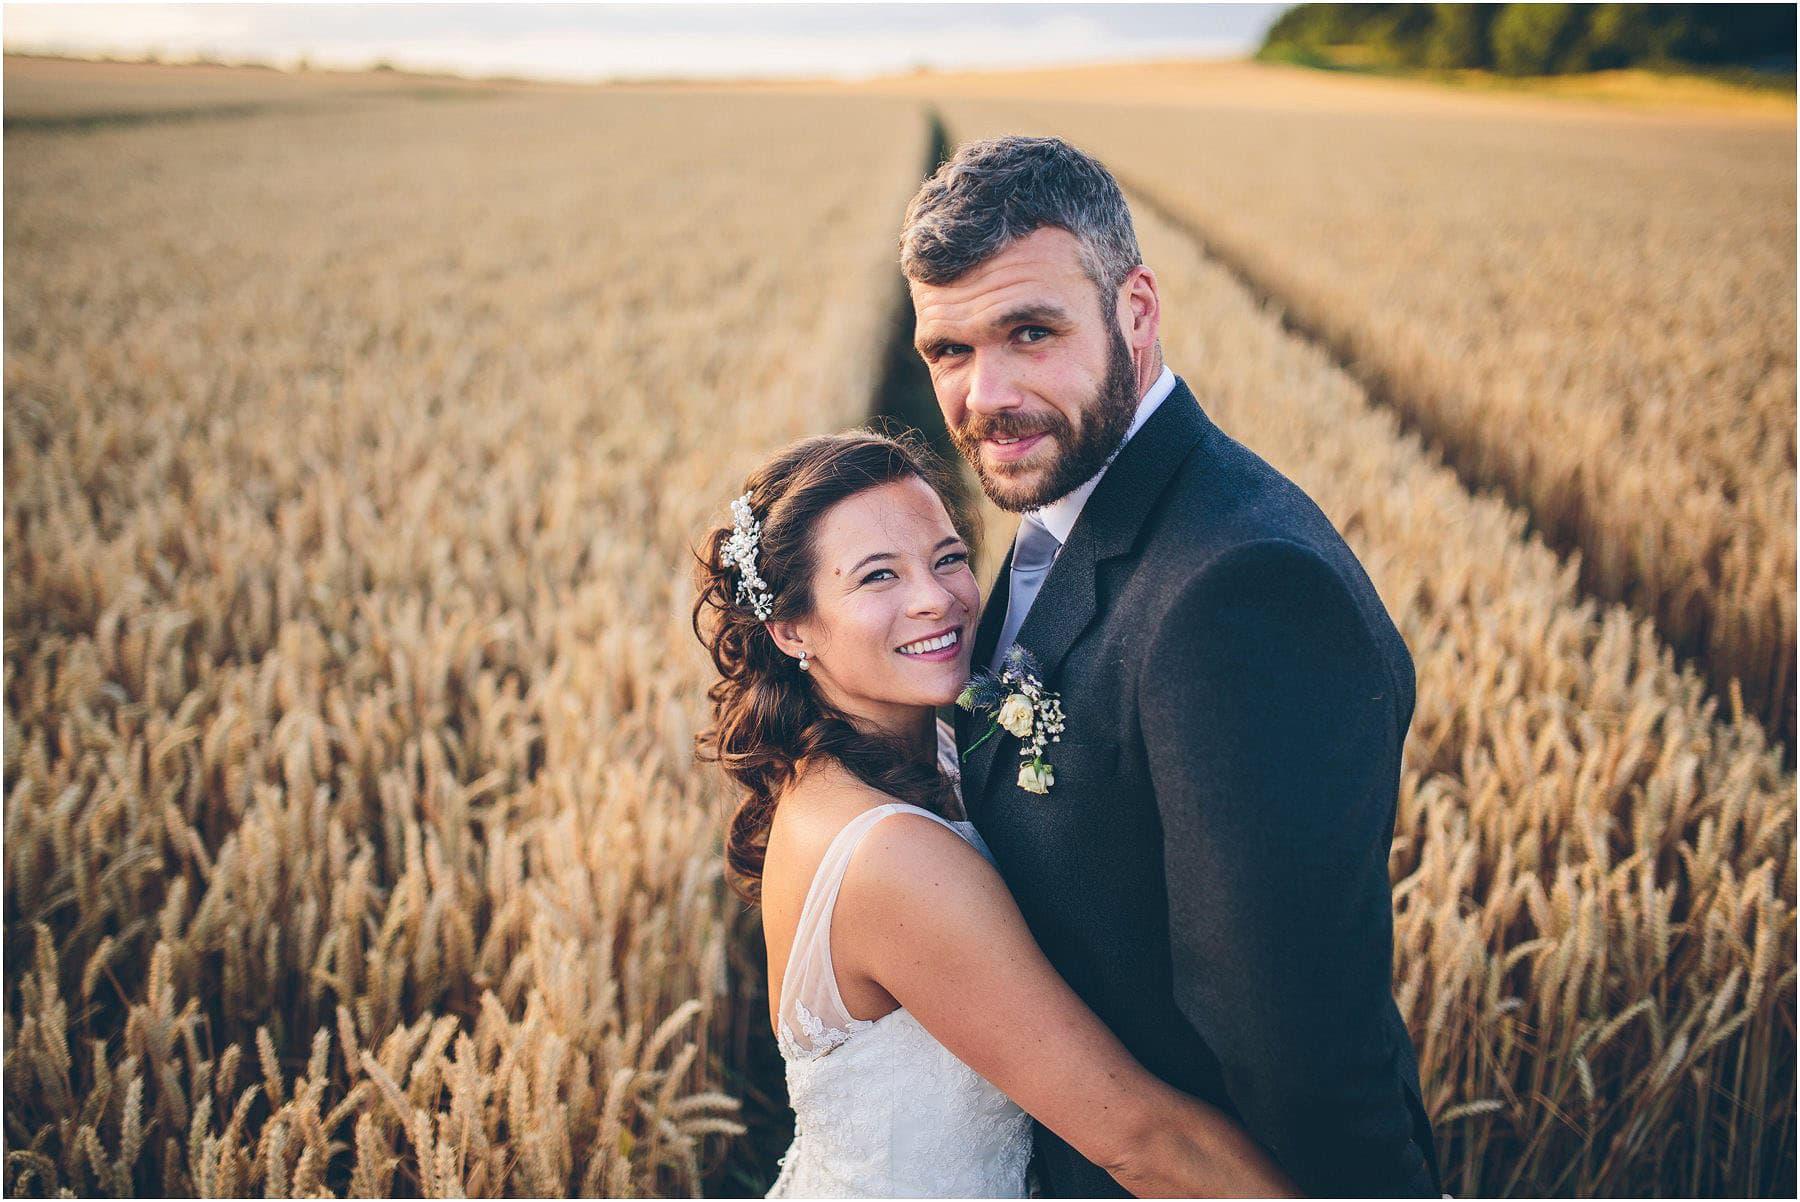 Swallows_Nest_Barn_Wedding_Photography_0168